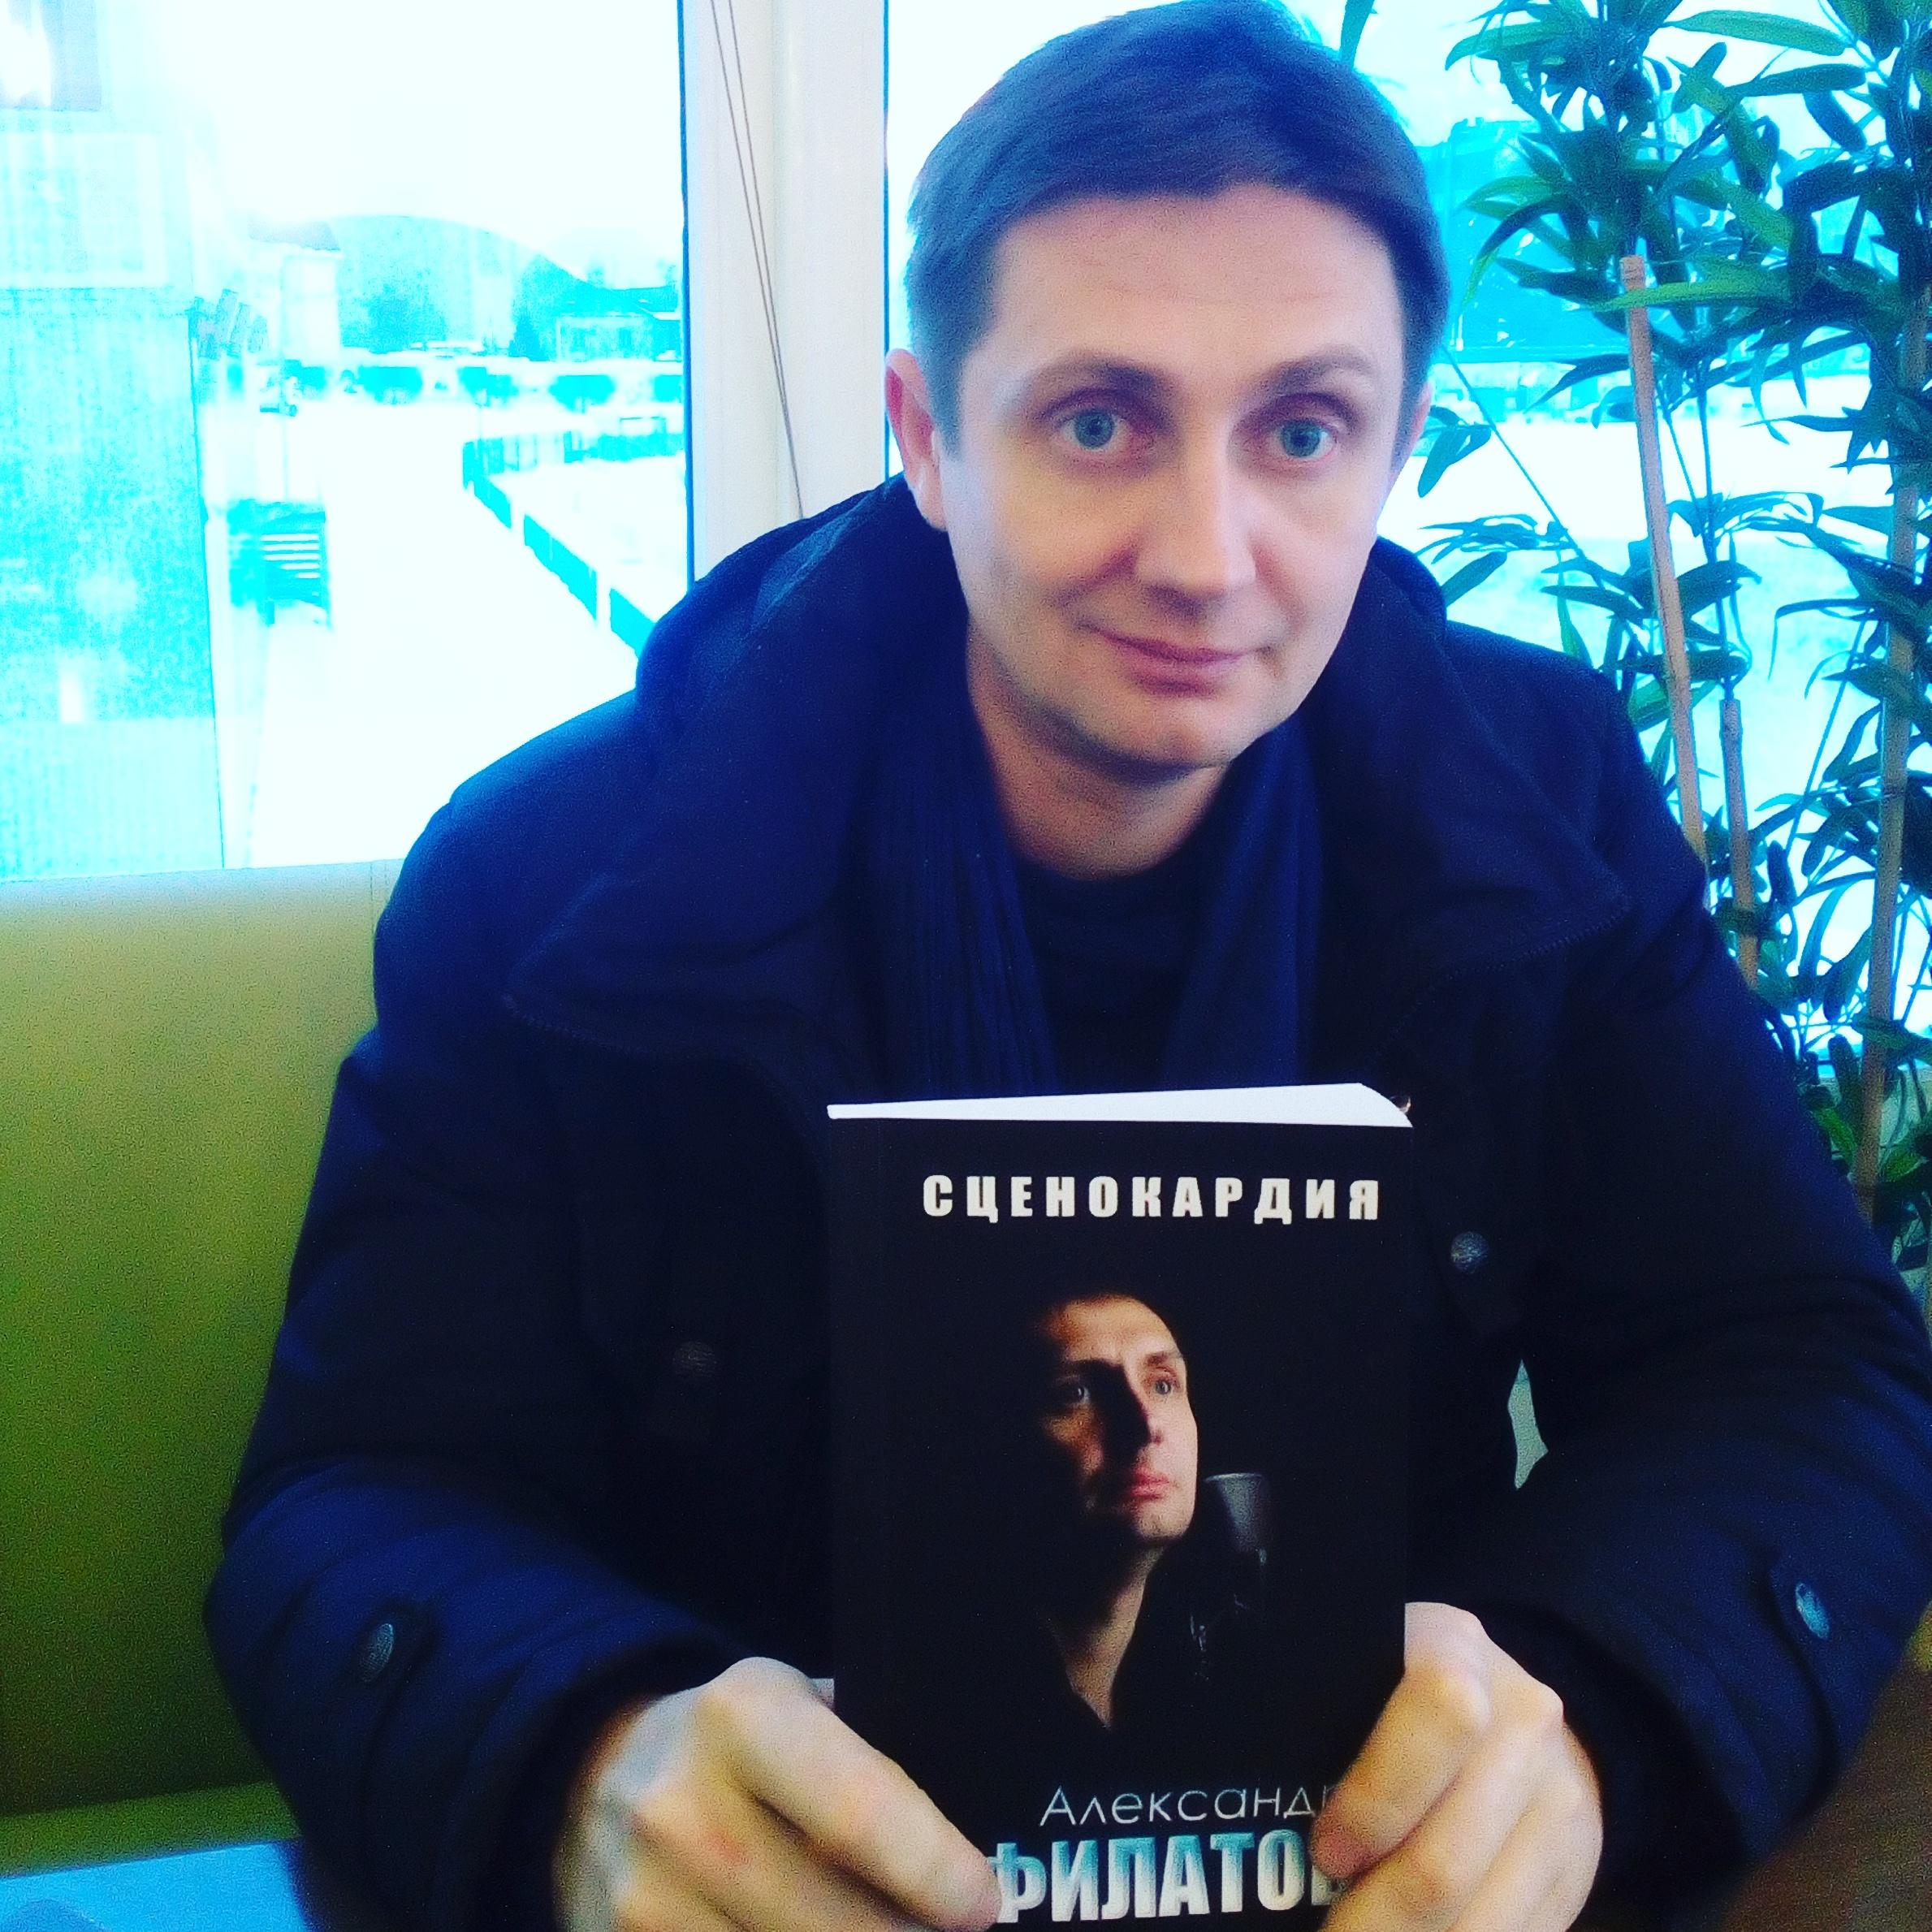 Александр Филатов, поэт, Сценокардия, новая книга